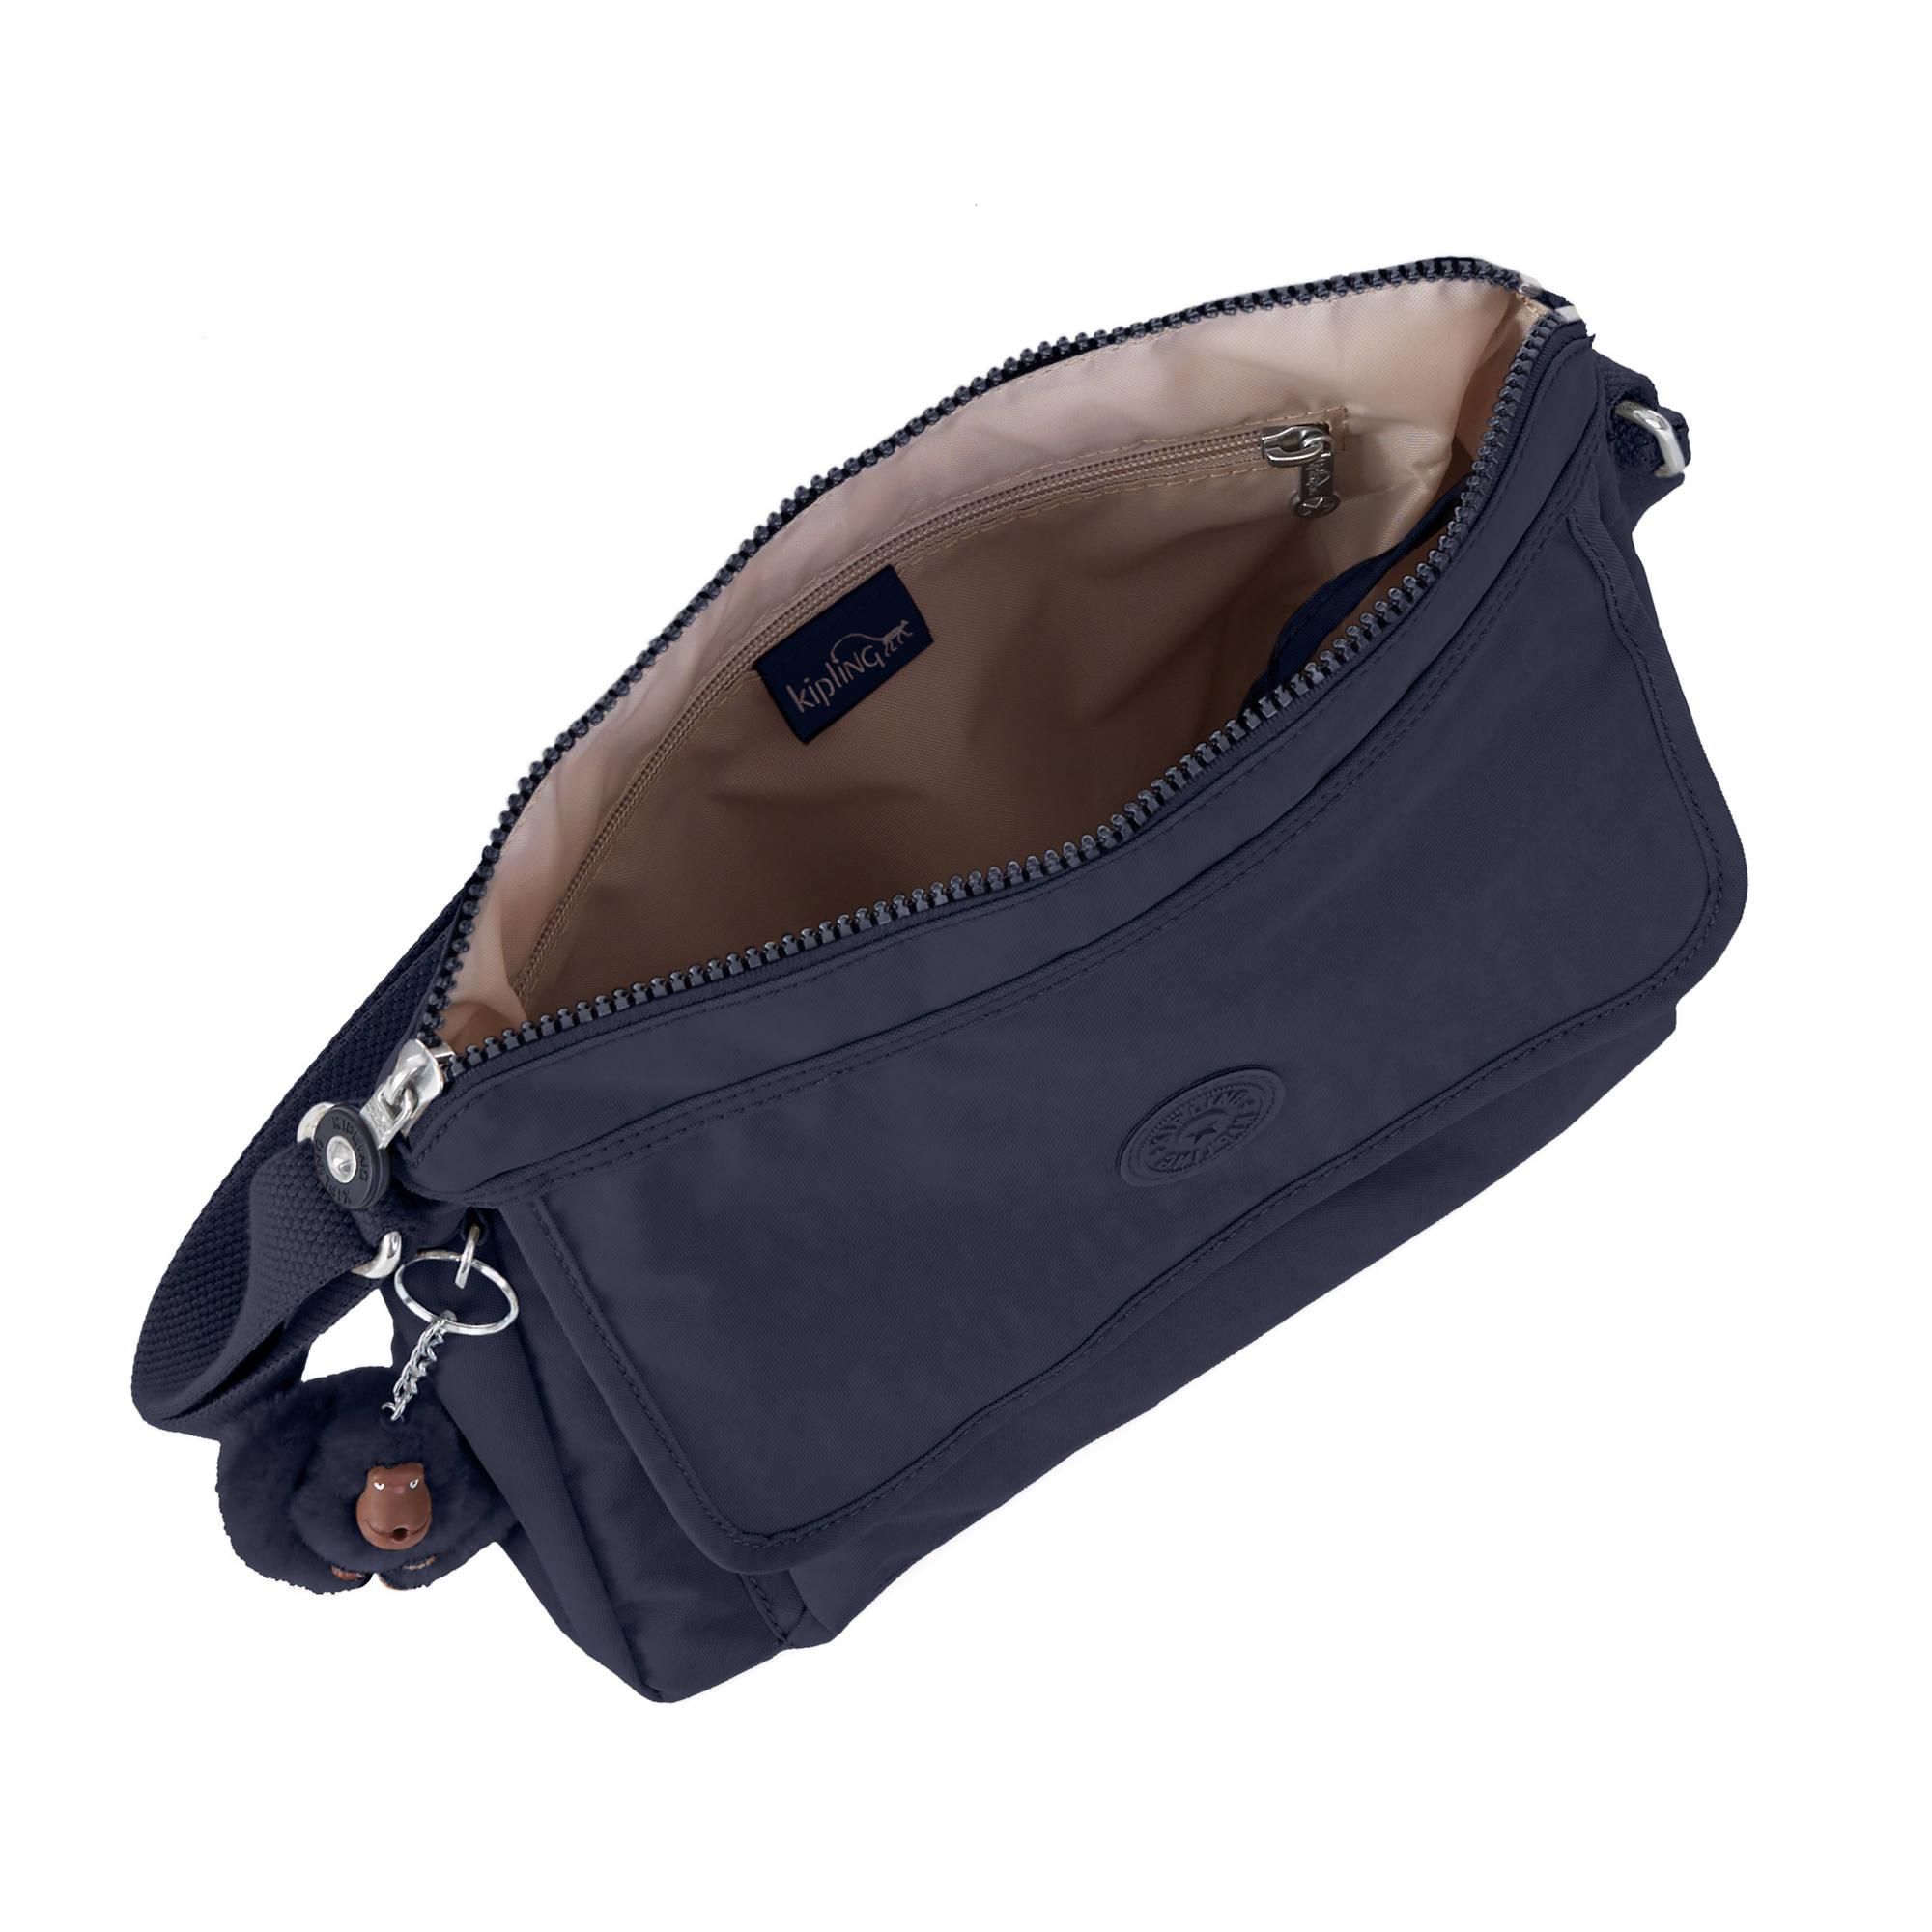 b615705f0 Aisling Crossbody Bag,True Navy,large